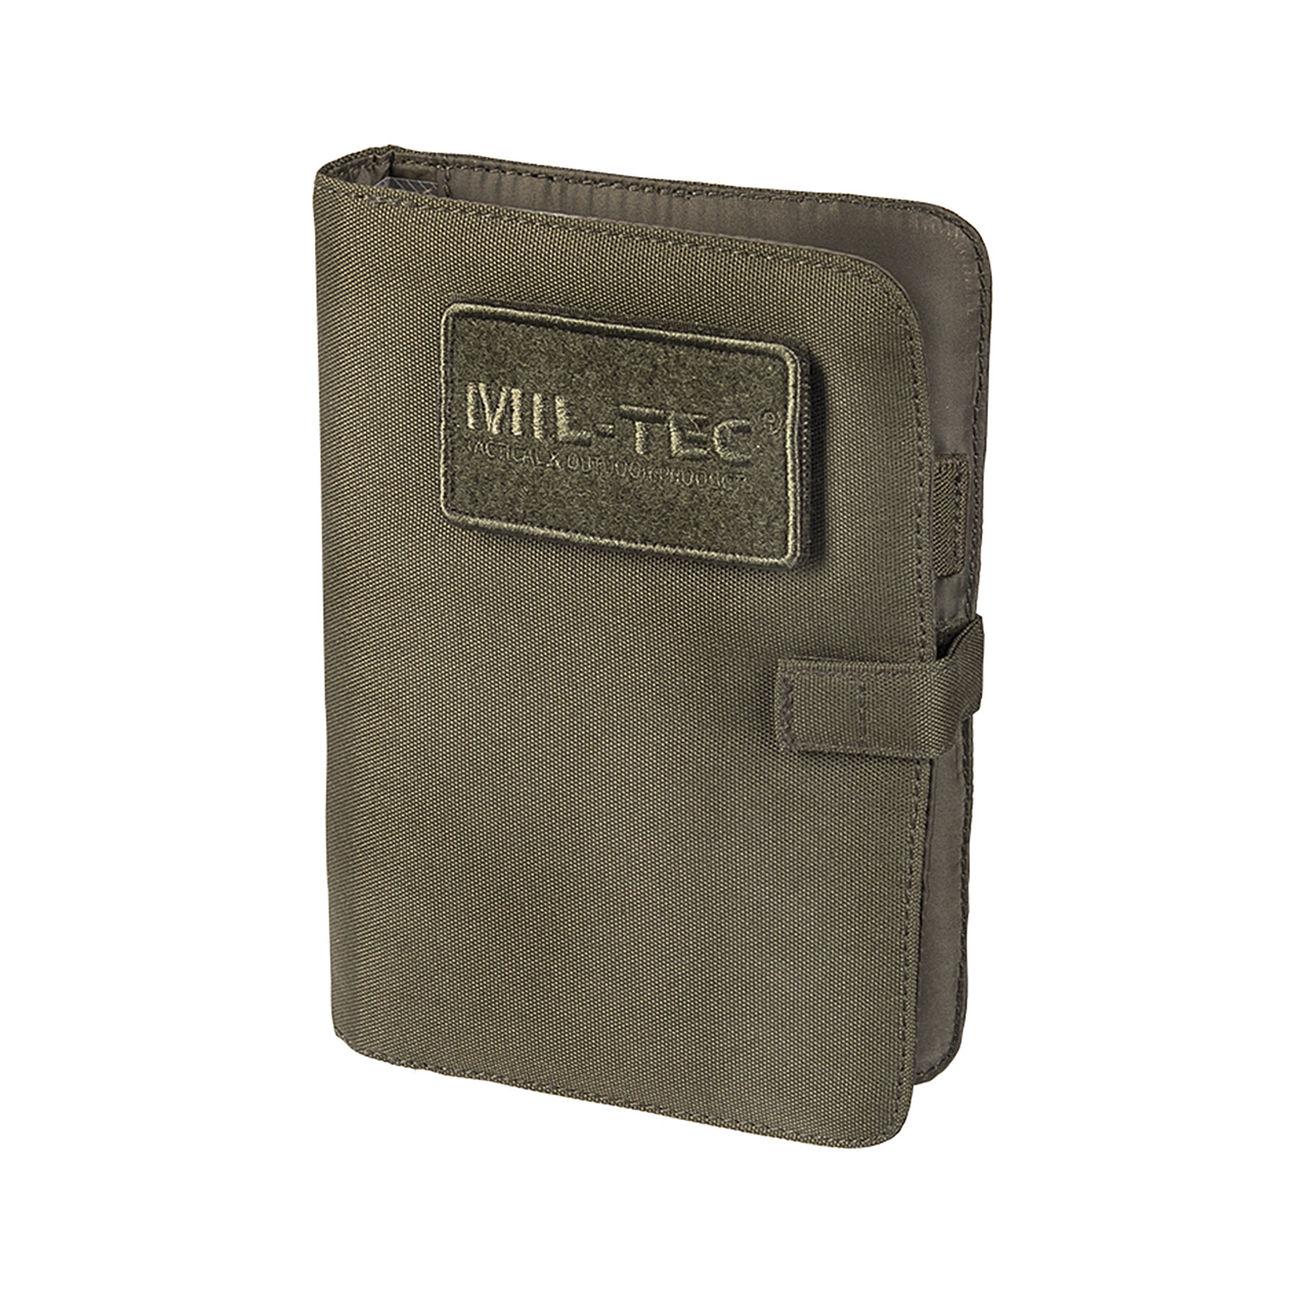 Billiger Preis Mil-tec Tactical Notebook Small Mandra Night Notizbuch Koffer, Taschen & Accessoires Kleidung & Accessoires